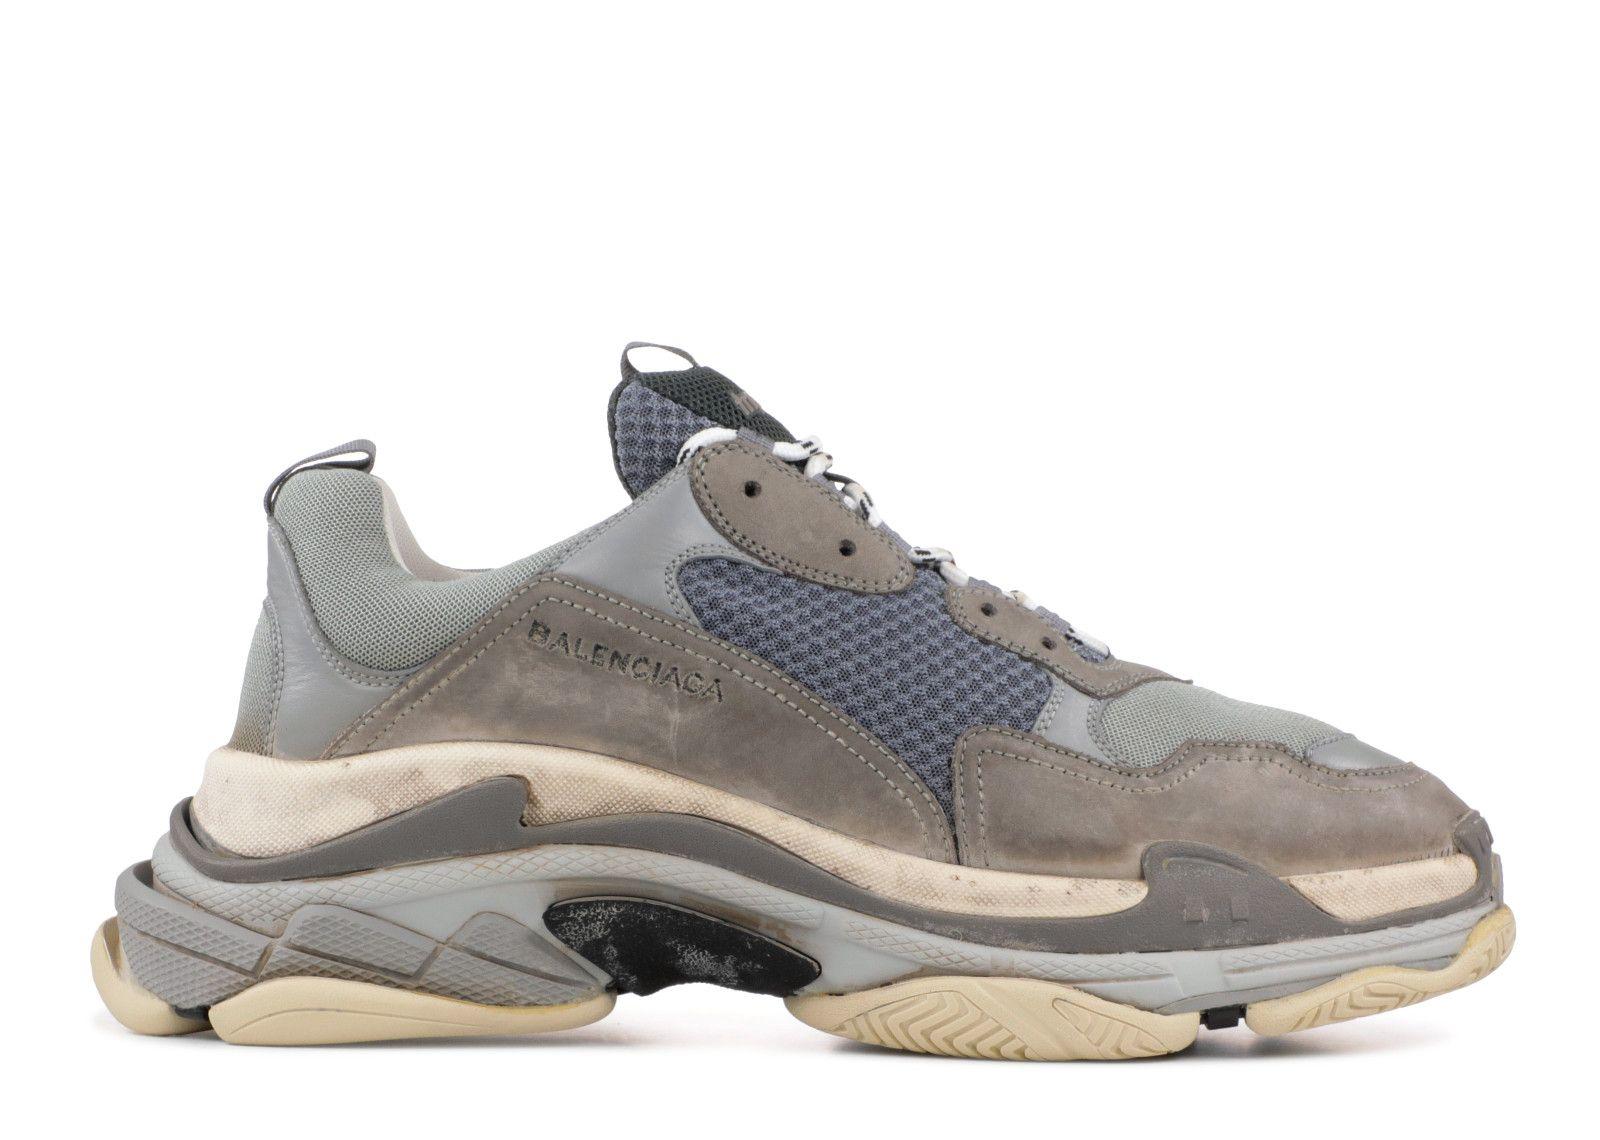 triple s | Shoes, Sneakers, Balenciaga